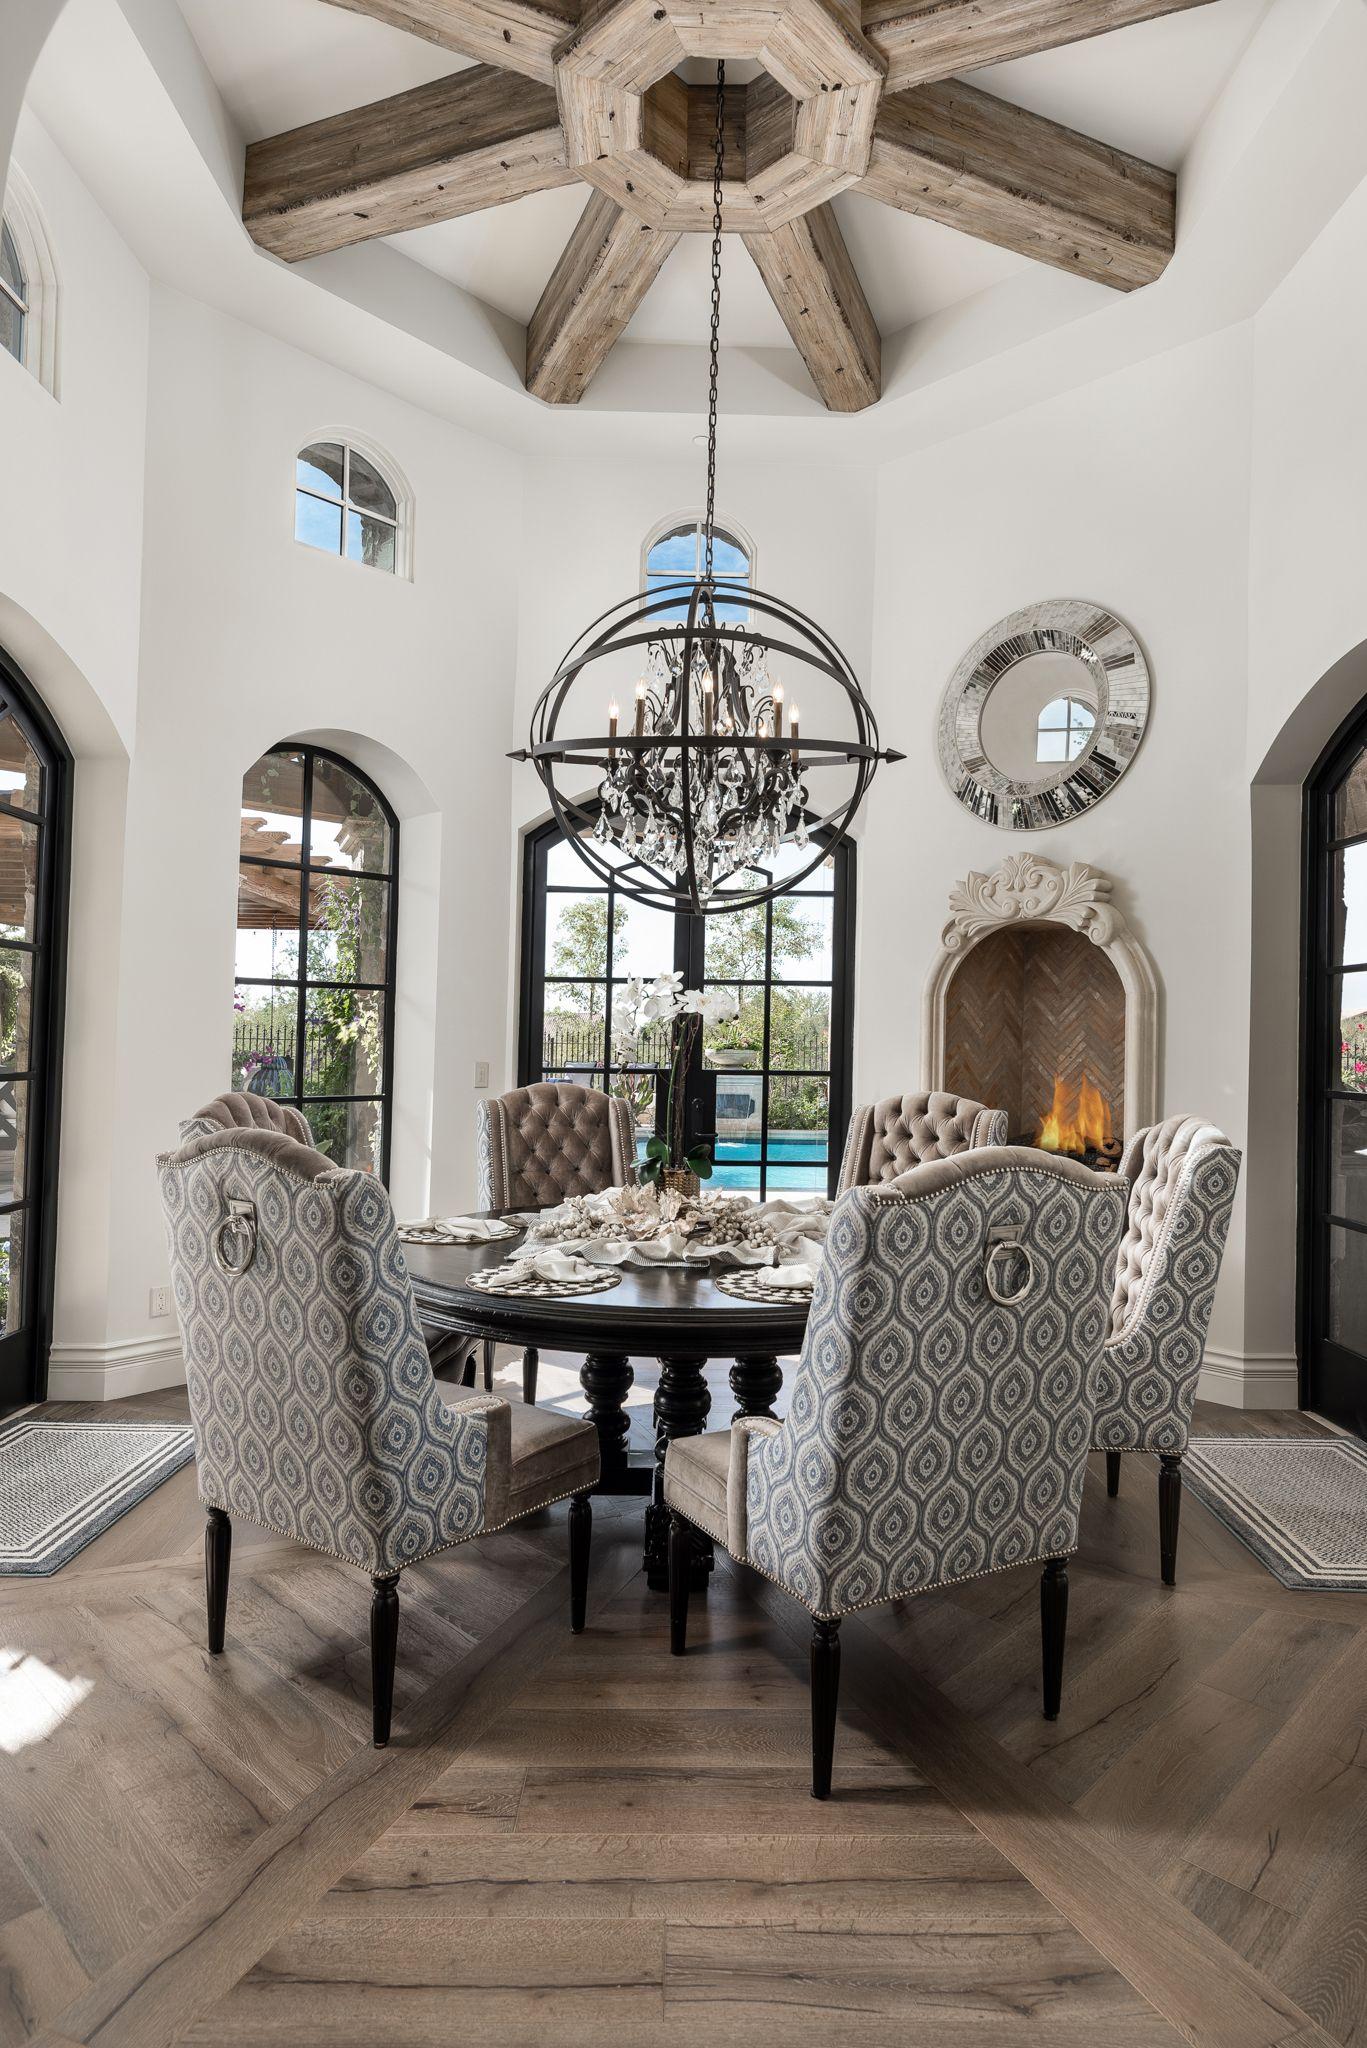 World Renowned Luxury Home Builder Fratantoni Luxury Estates Built